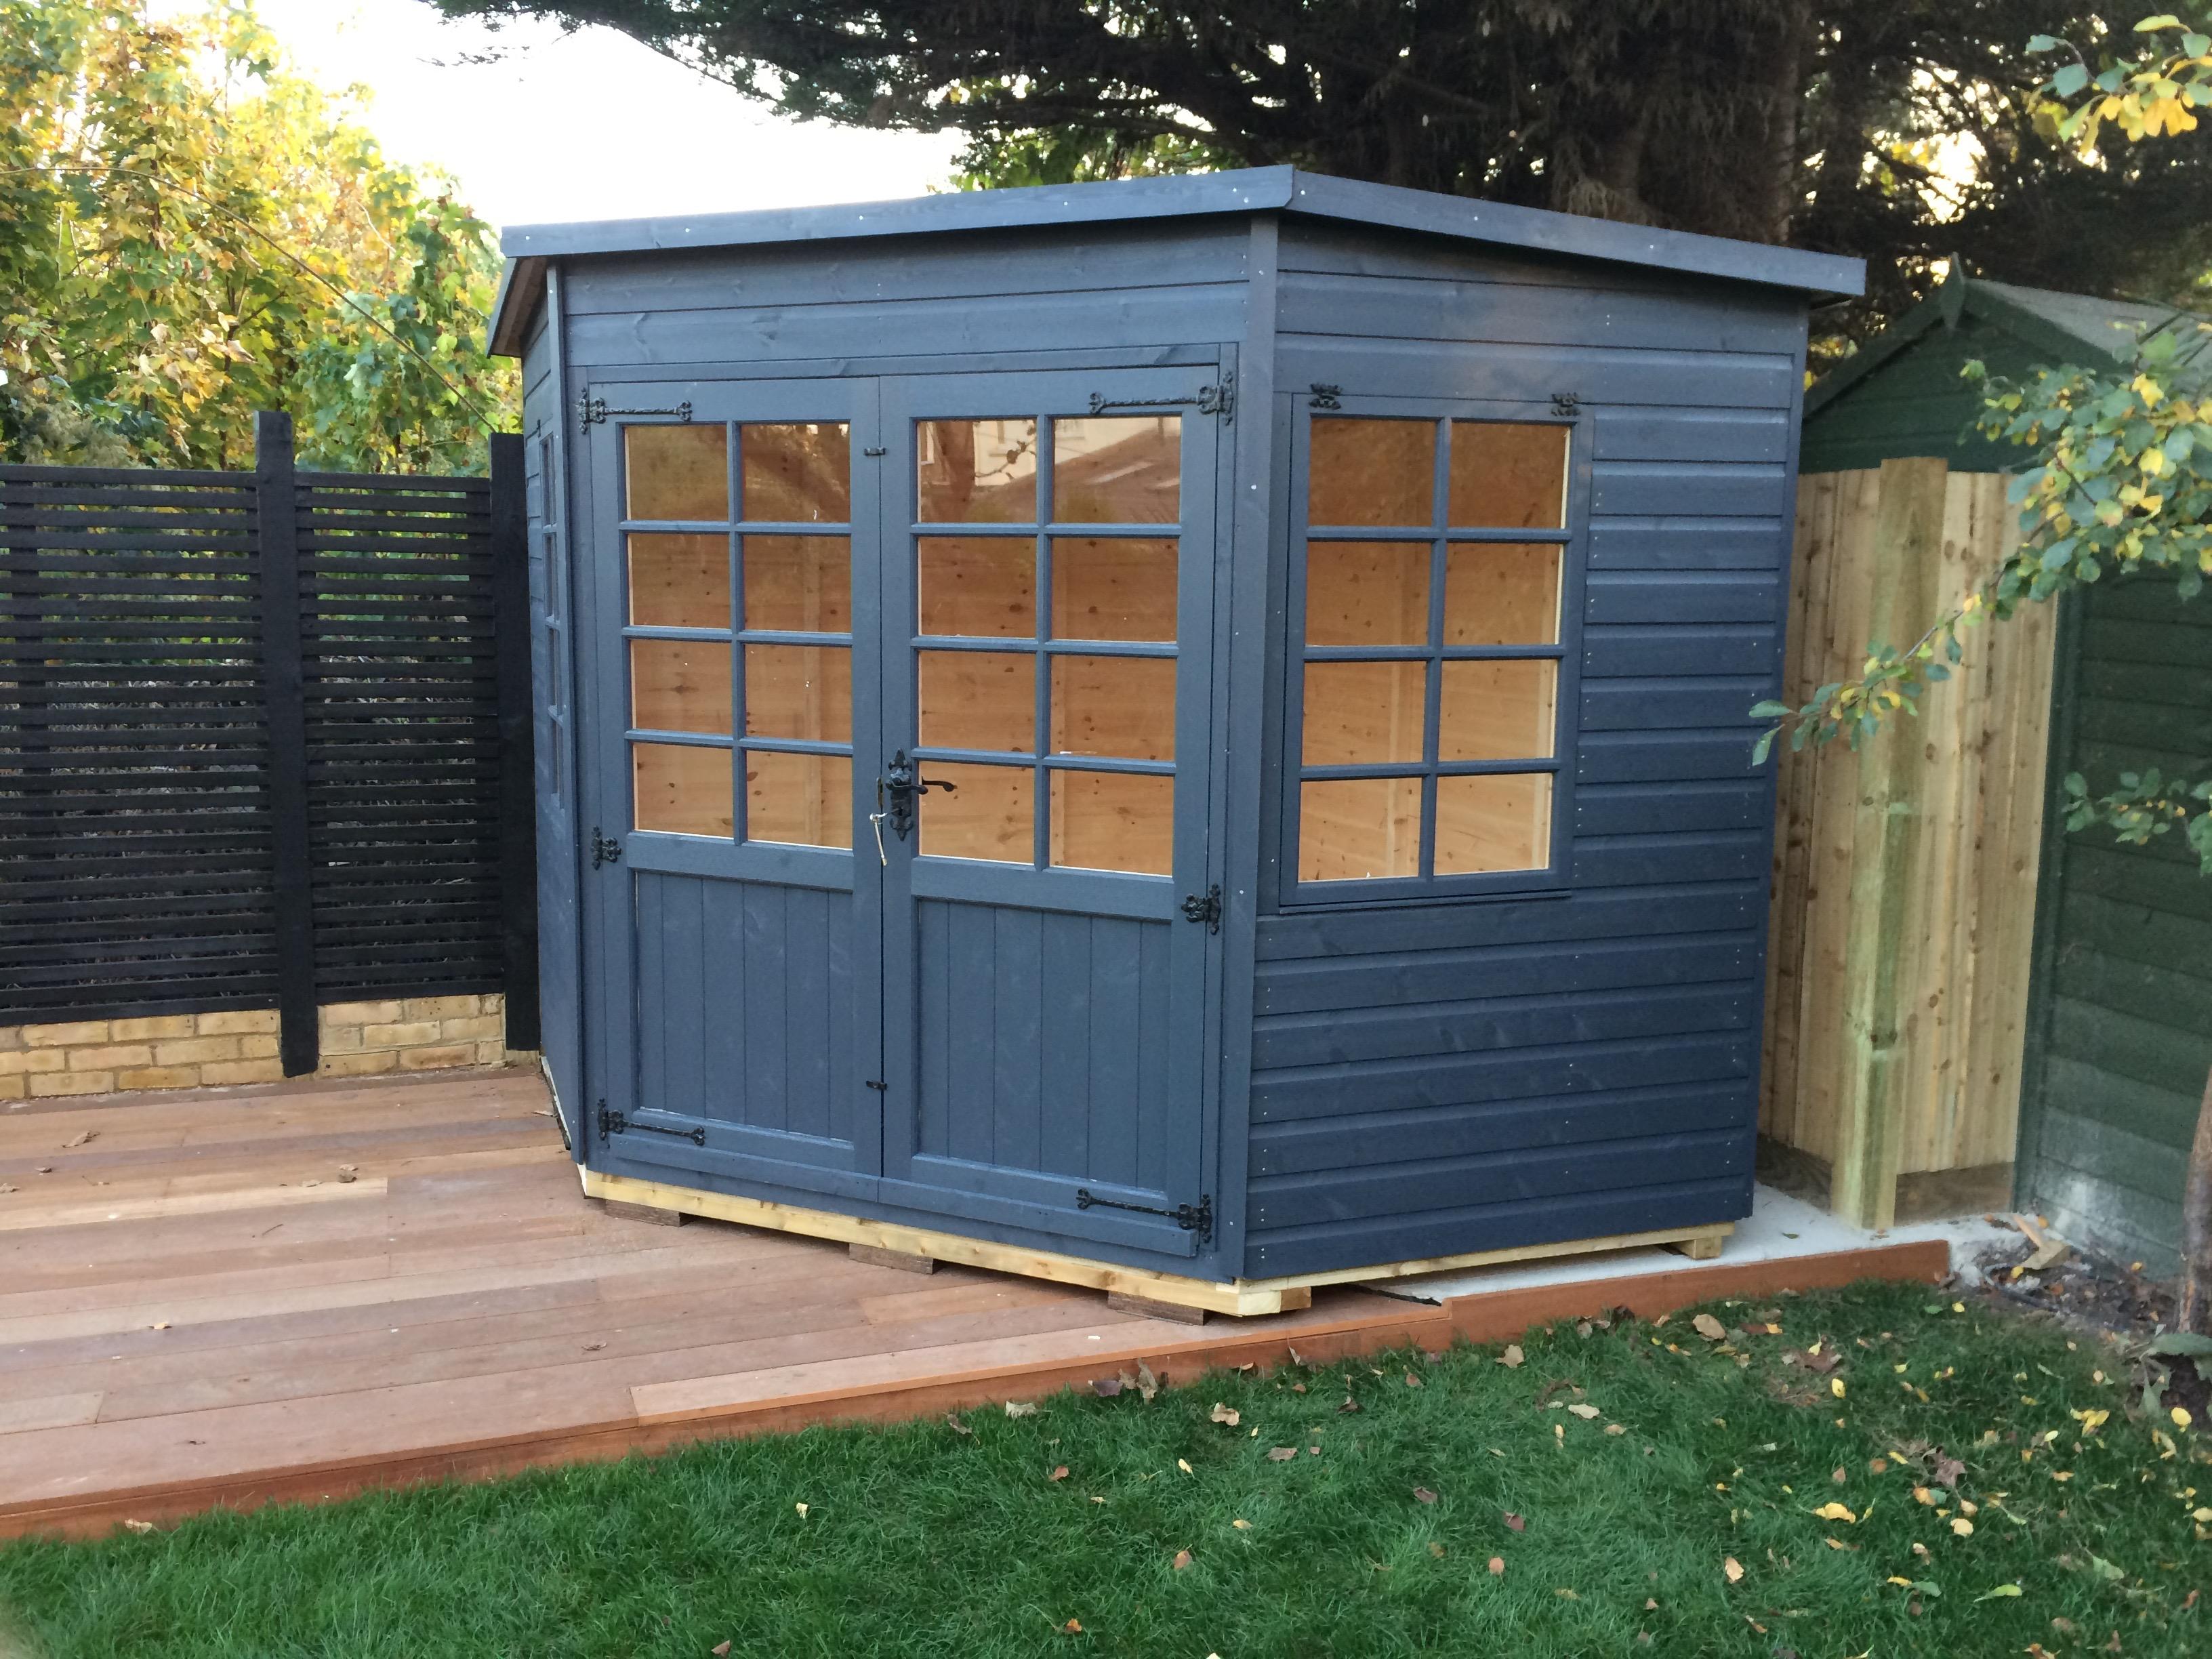 wid hei qlt p sheds rubbermaid shed prod x storage